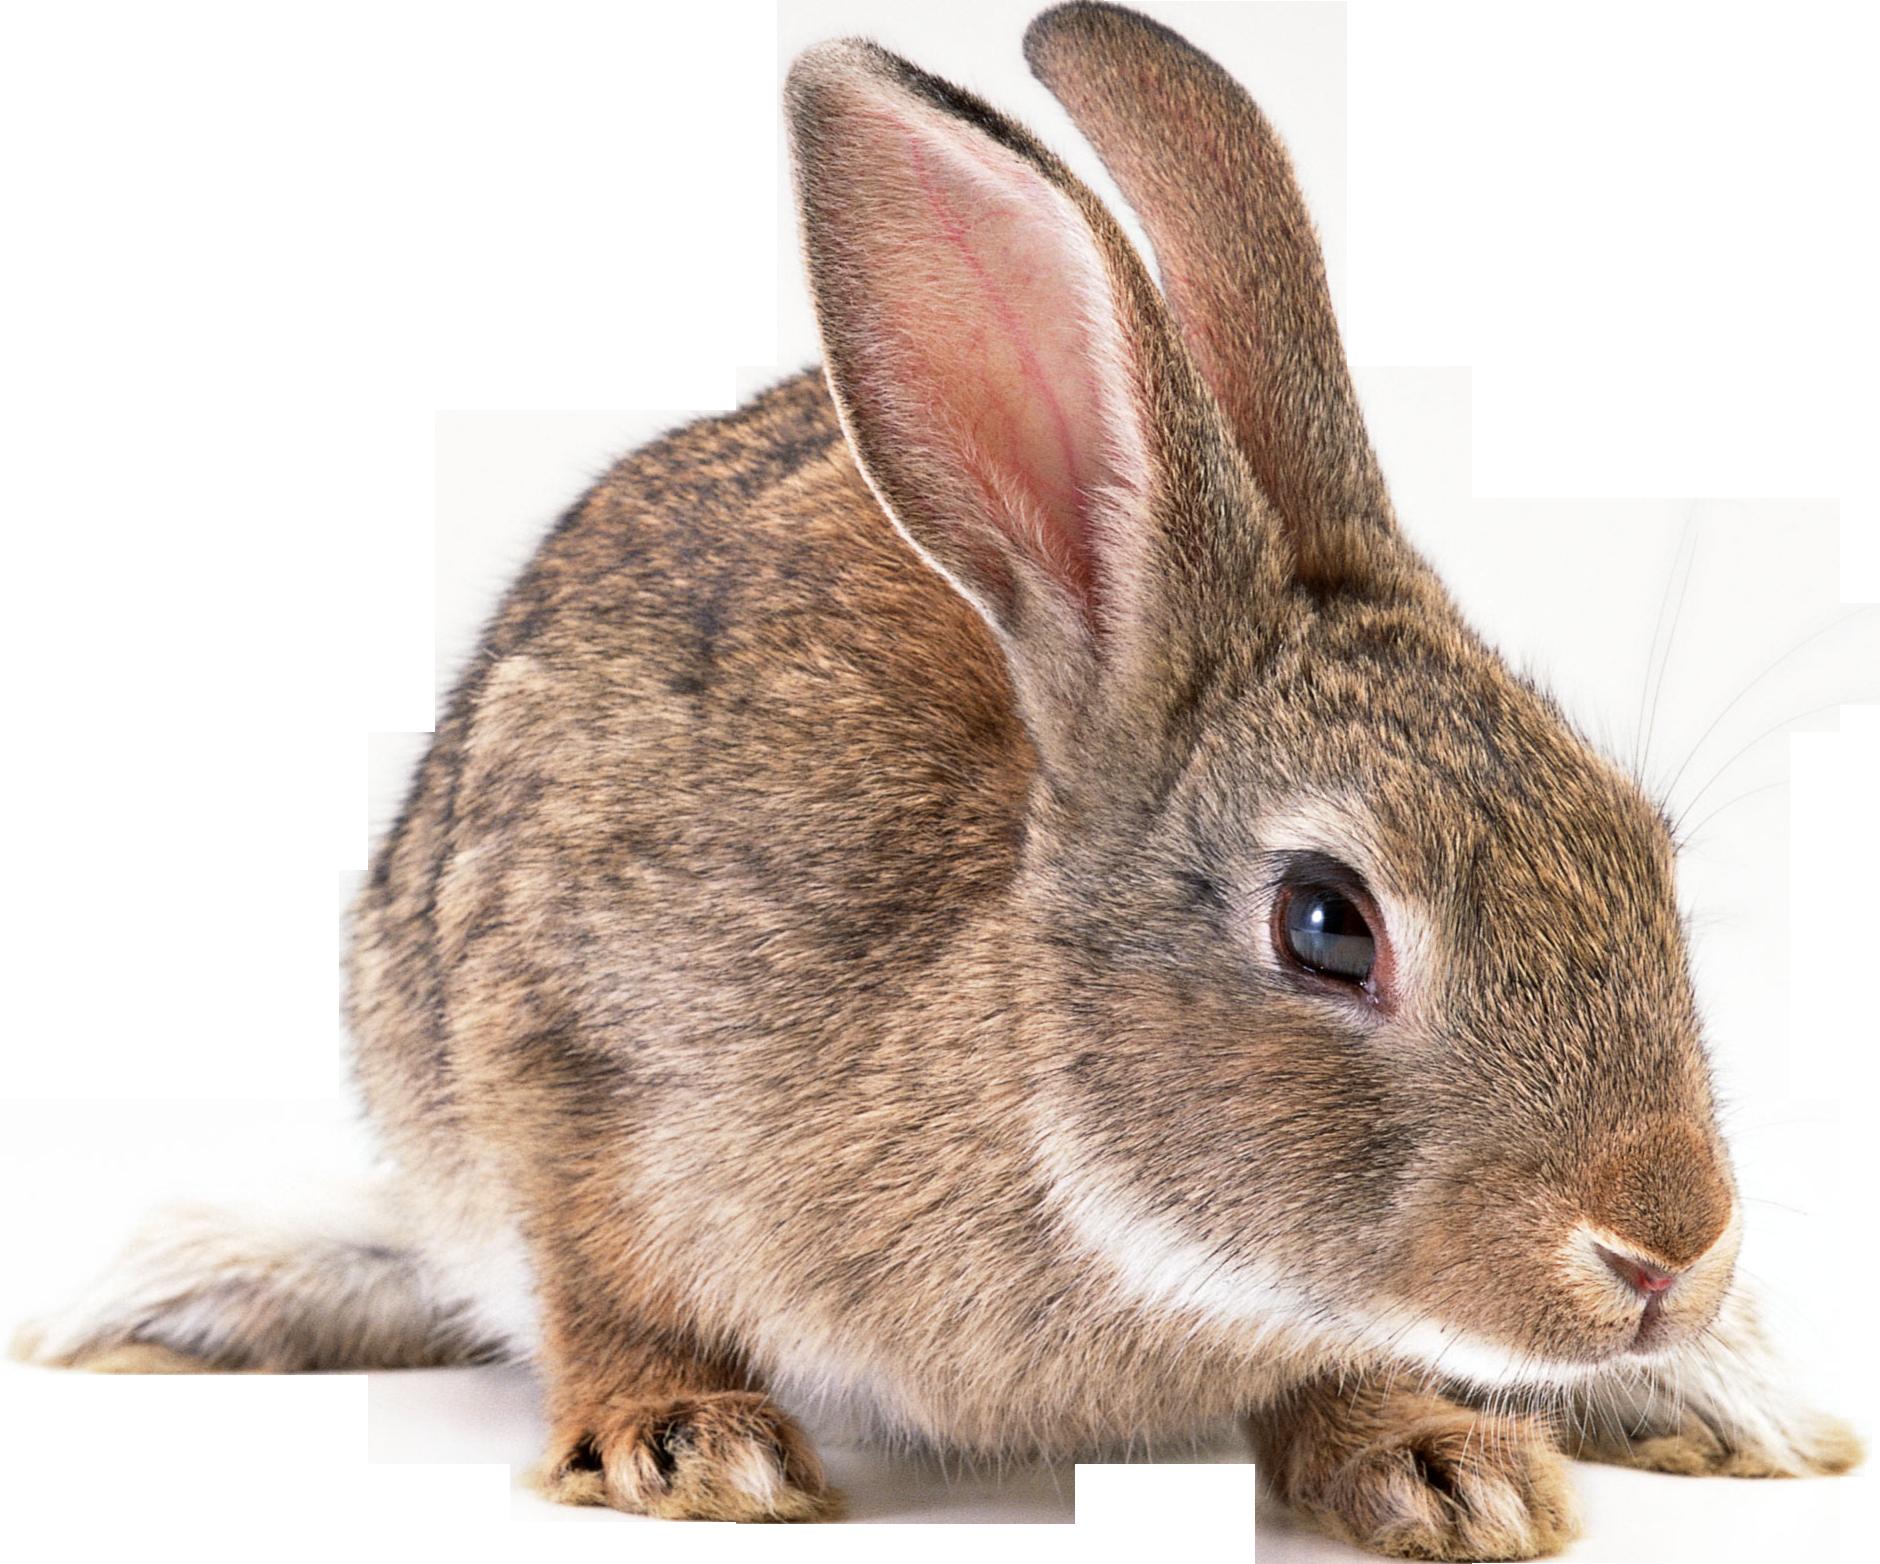 Gray Rabbit Png Image - Rabbit, Transparent background PNG HD thumbnail